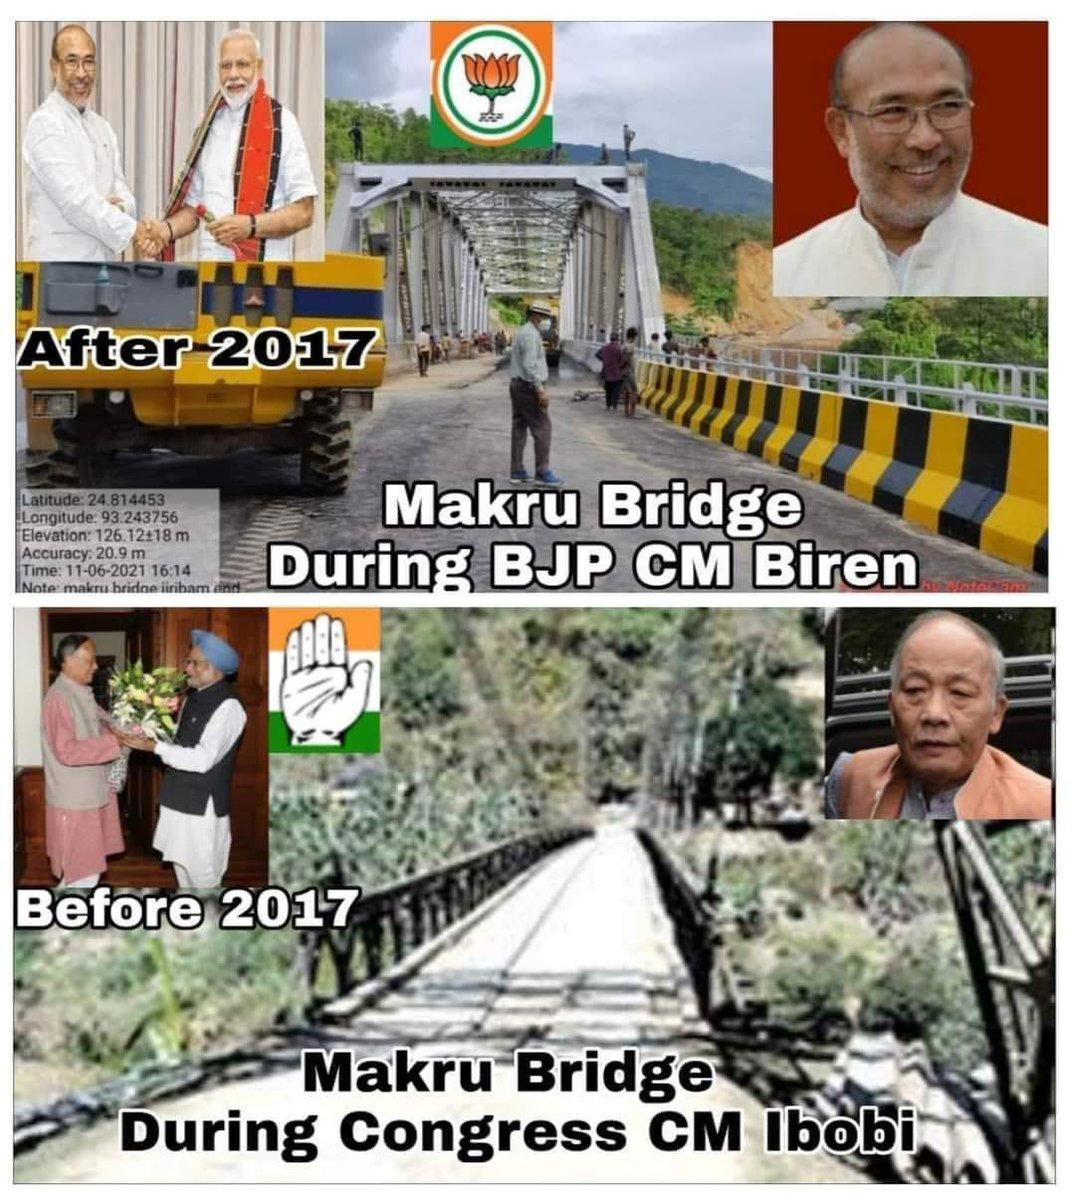 Thanks Hon'ble PM @narendramodi ji, HCM @NBirenSingh for the #lifeline bridge of #manipur which is about to #complete & #Inauguration anytime.This is real joyful moment. Jai Hind @nitin_gadkari @JPNadda @sambitswaraj @VungzaginValte @BJP4India @BJP4Manipur 🙏 https://t.co/F6DC3atW09